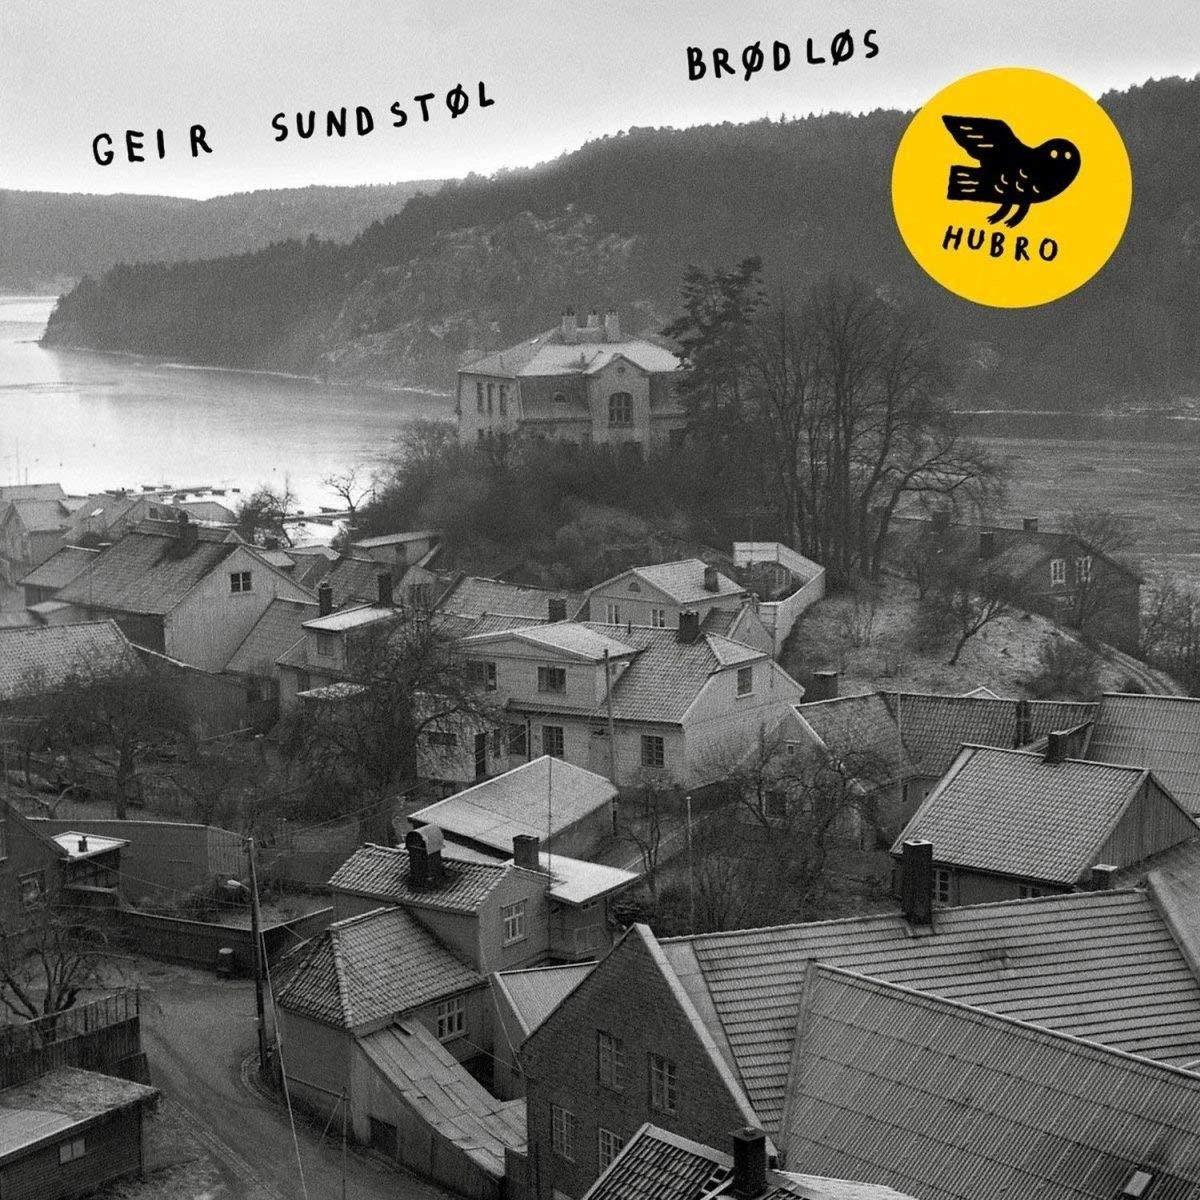 GEIR SUNDSTØL - Brødløs cover